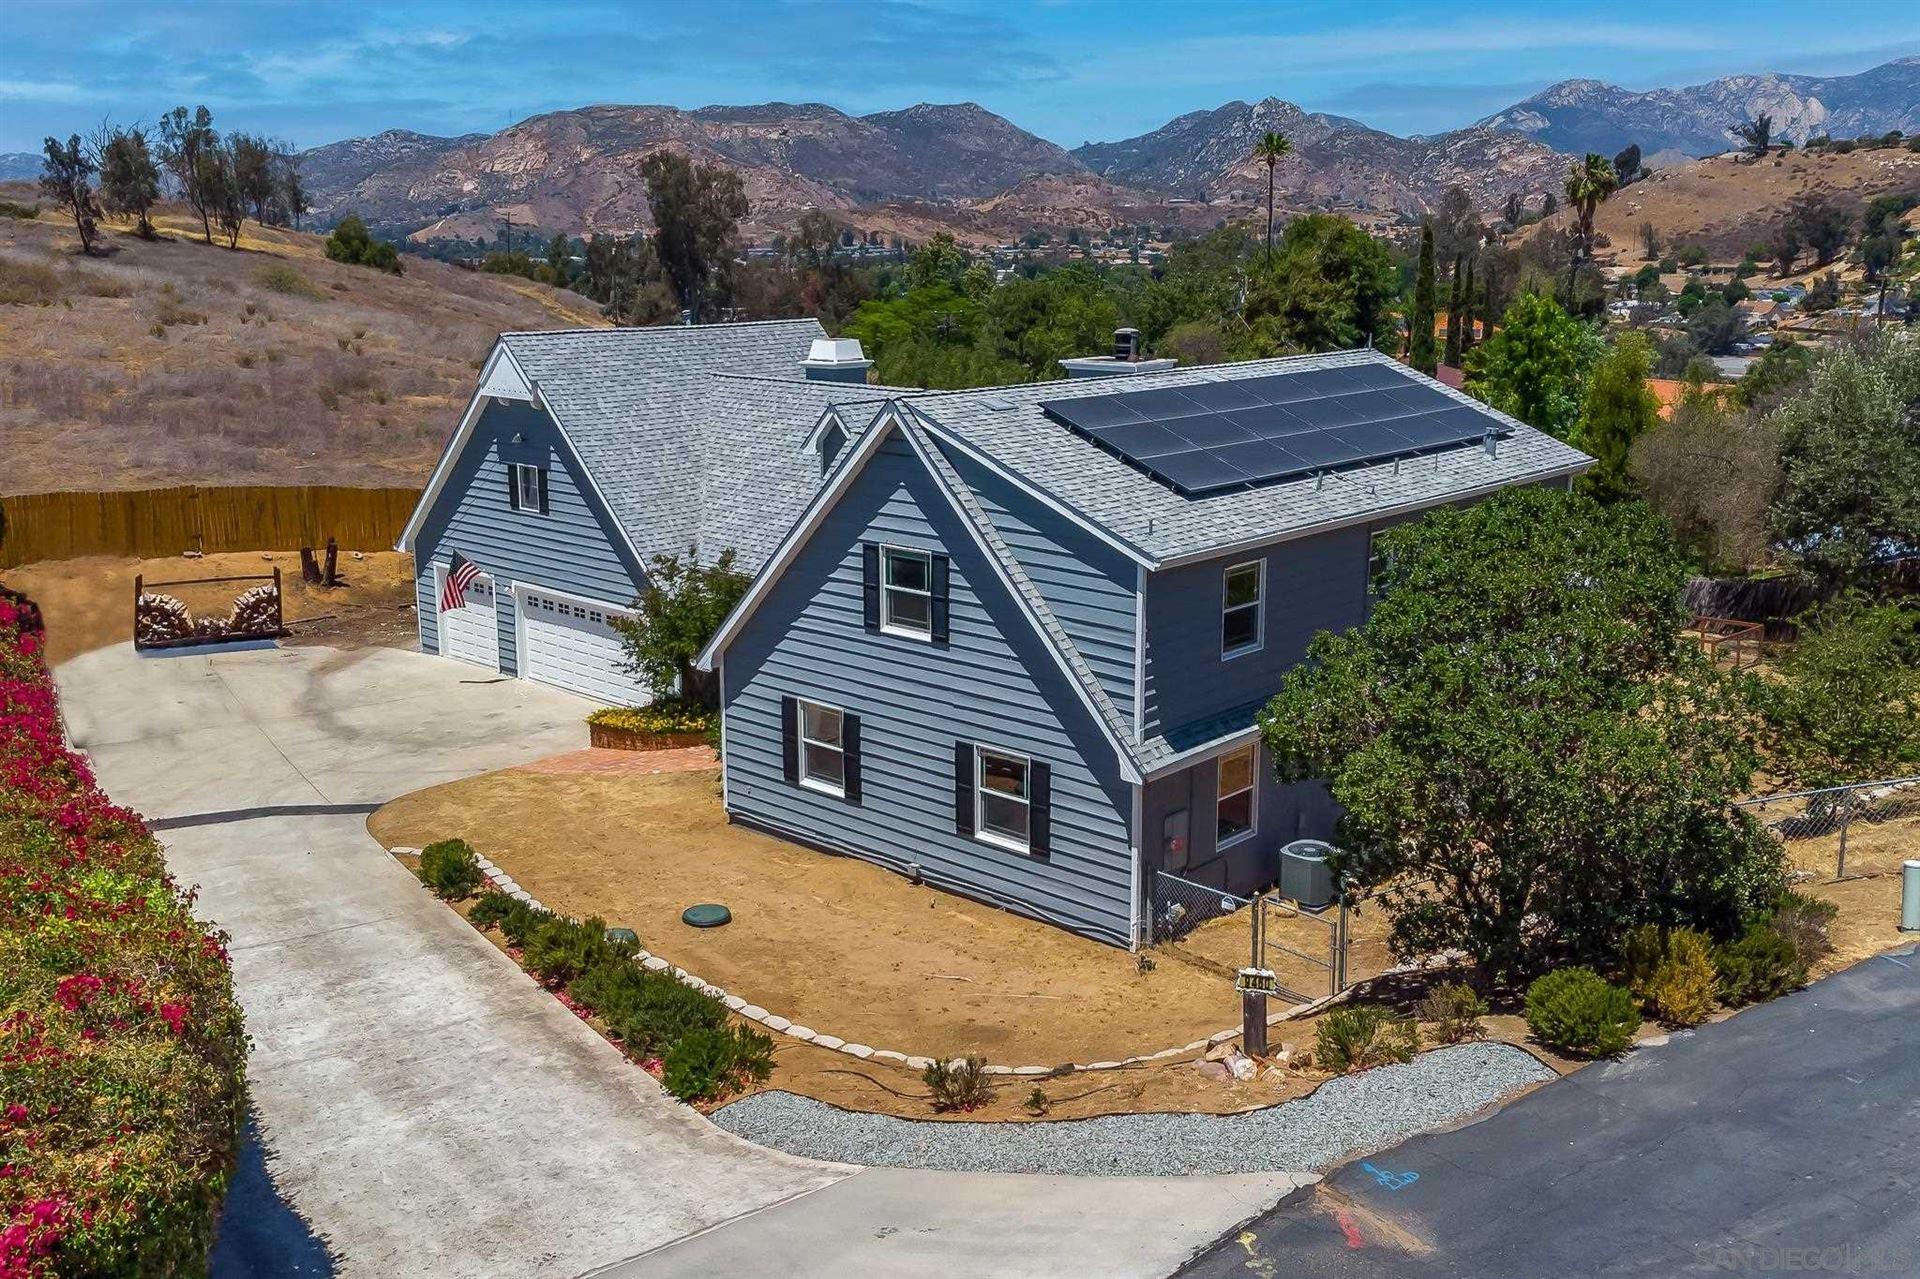 Photo of 9460 Rockcrest Ln, Lakeside, CA 92040 (MLS # 210016056)